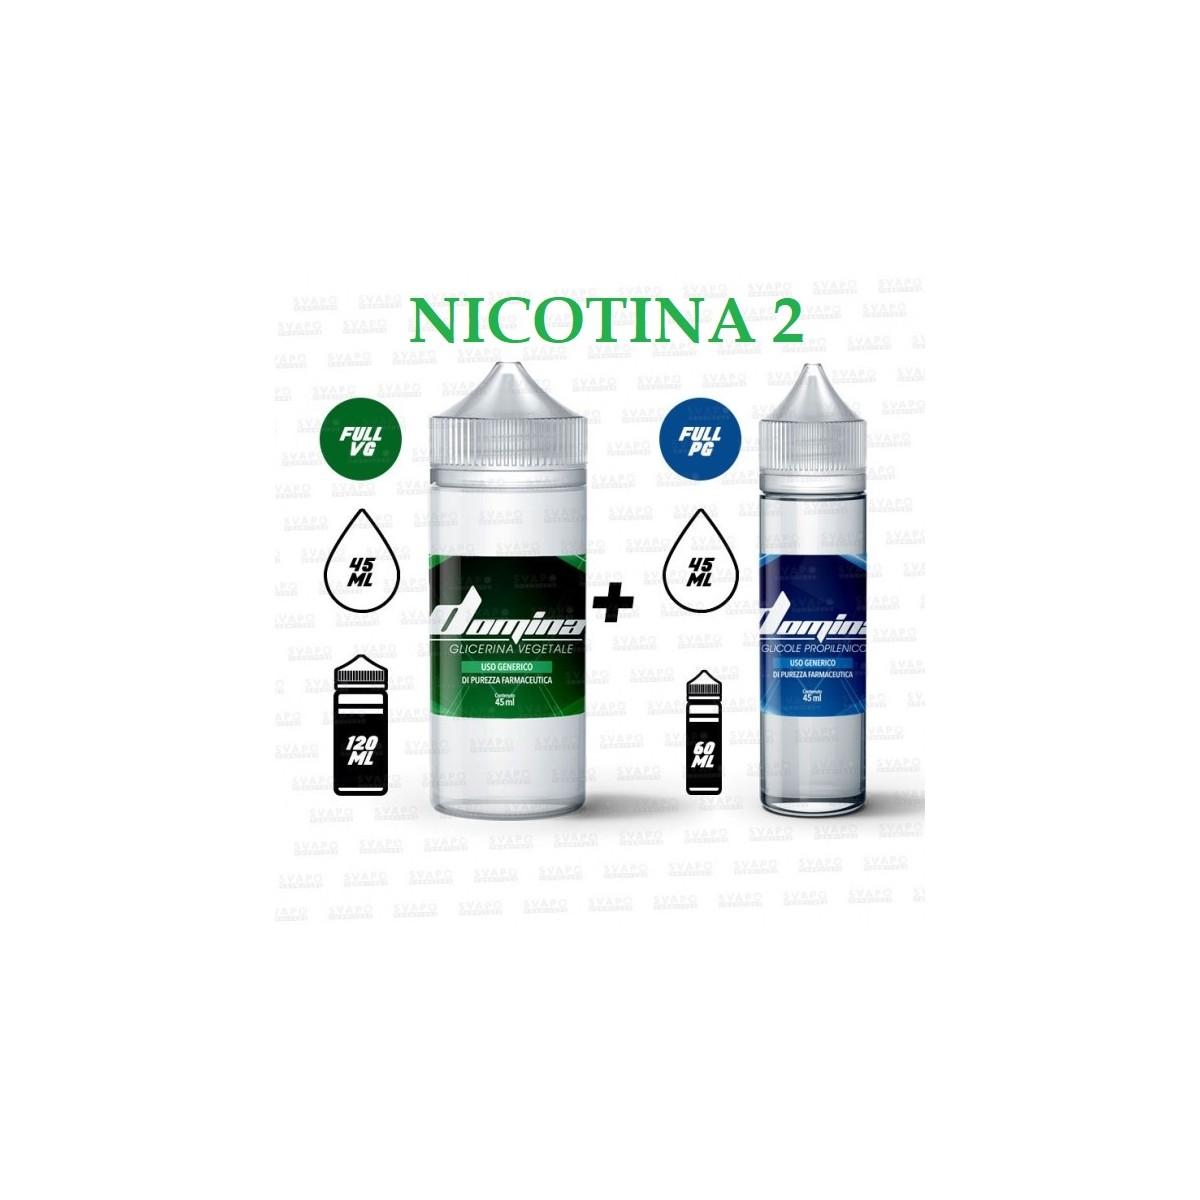 Bundle - Domina 100 Series 50/50 - 2mg/ml Nic